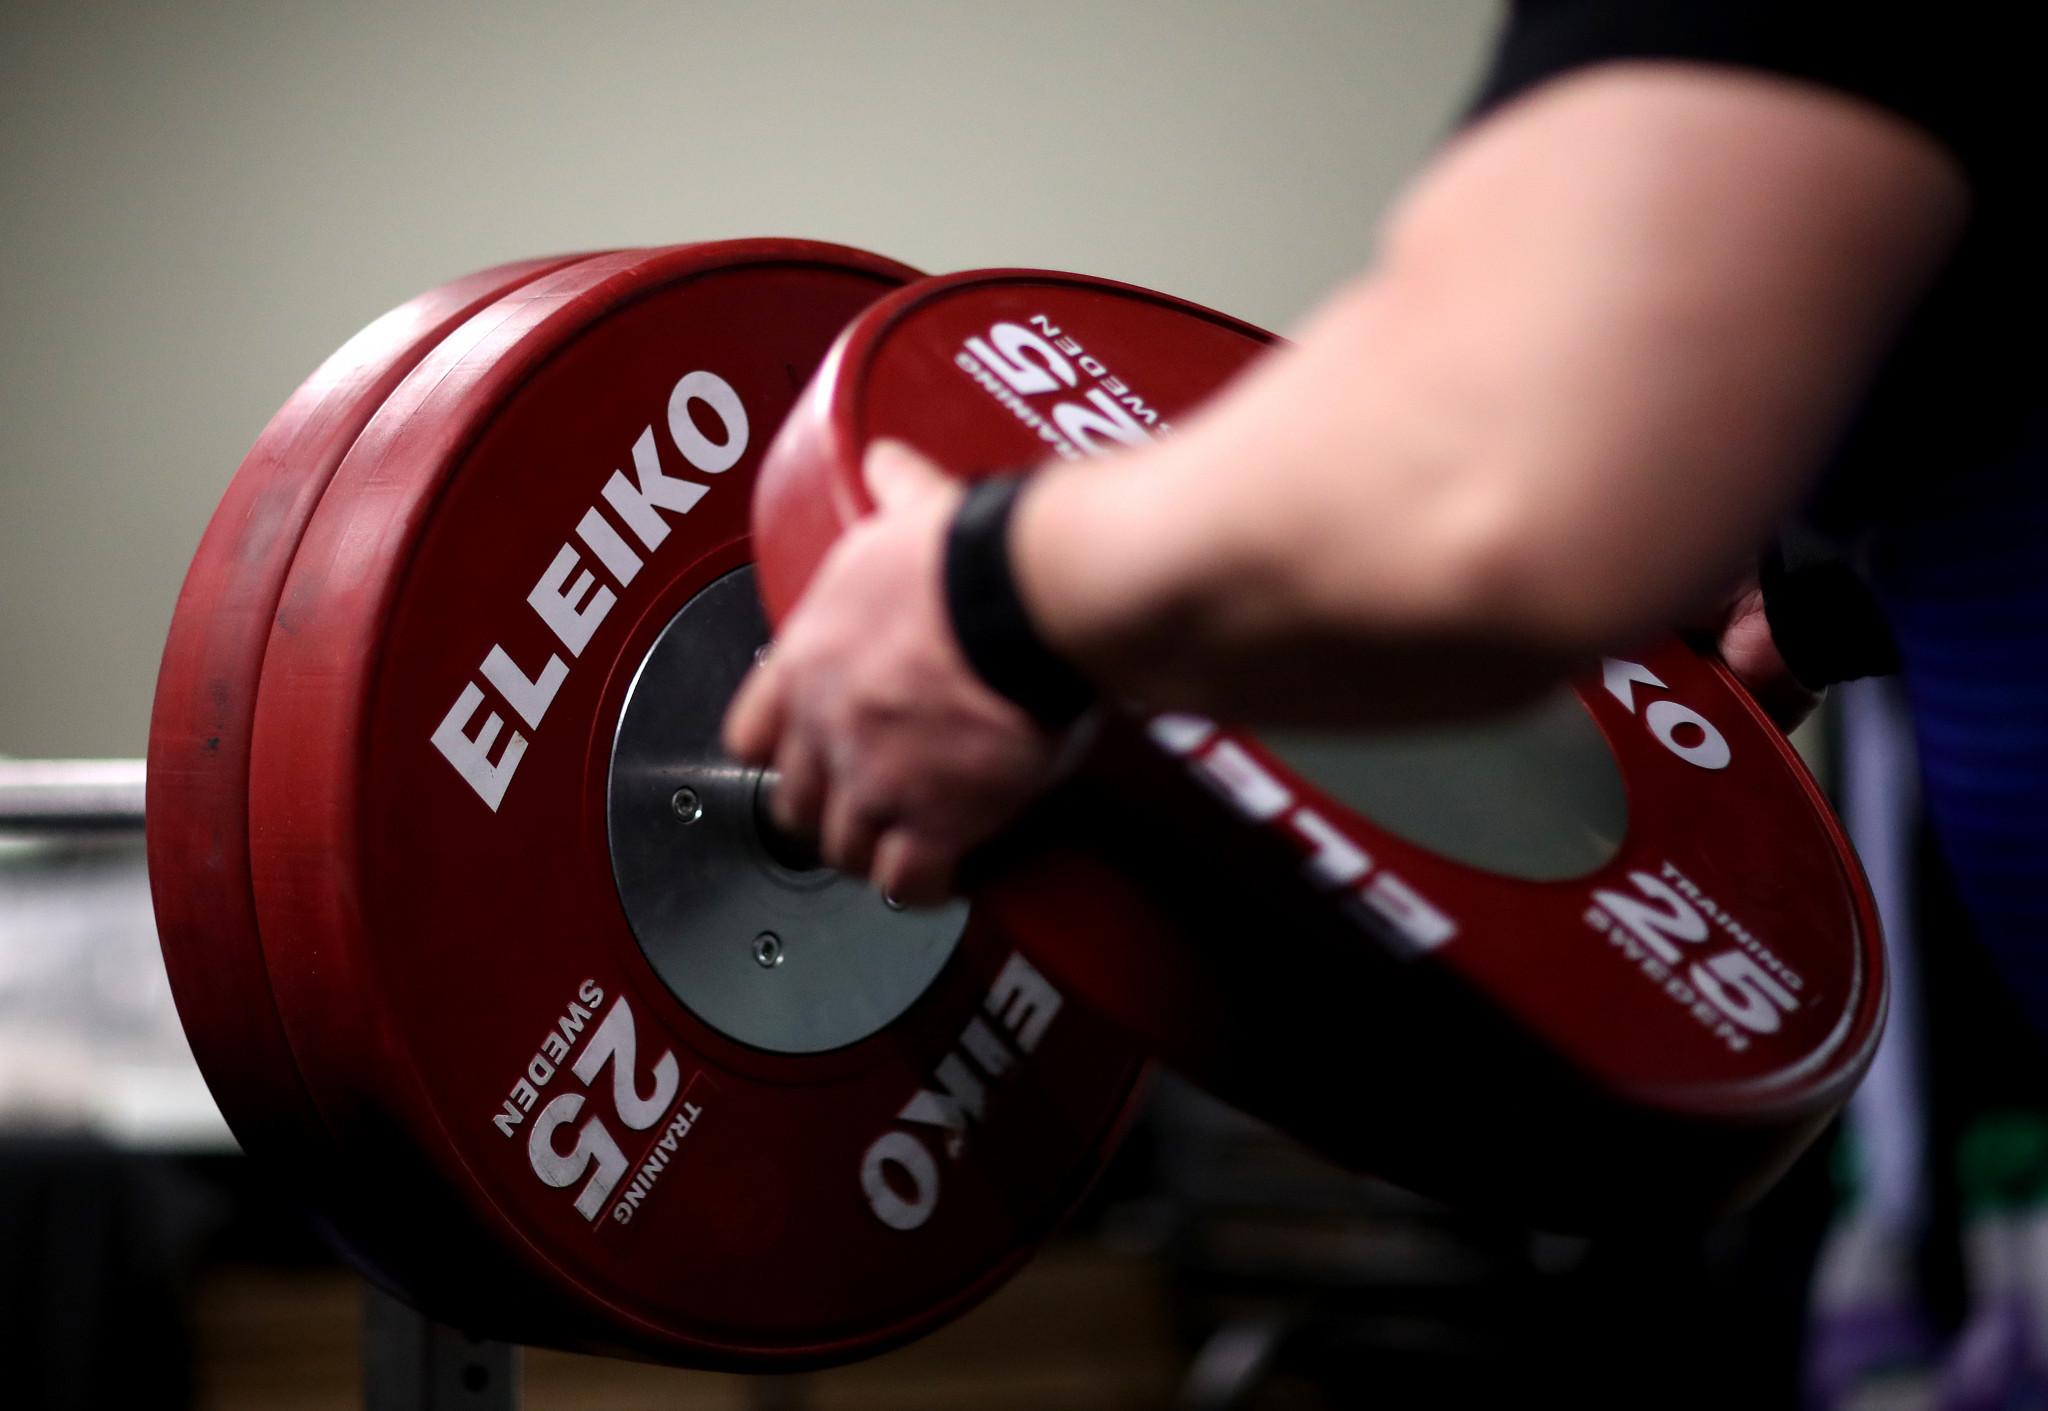 Dubai set to host final World Para Powerlifting World Cup of season